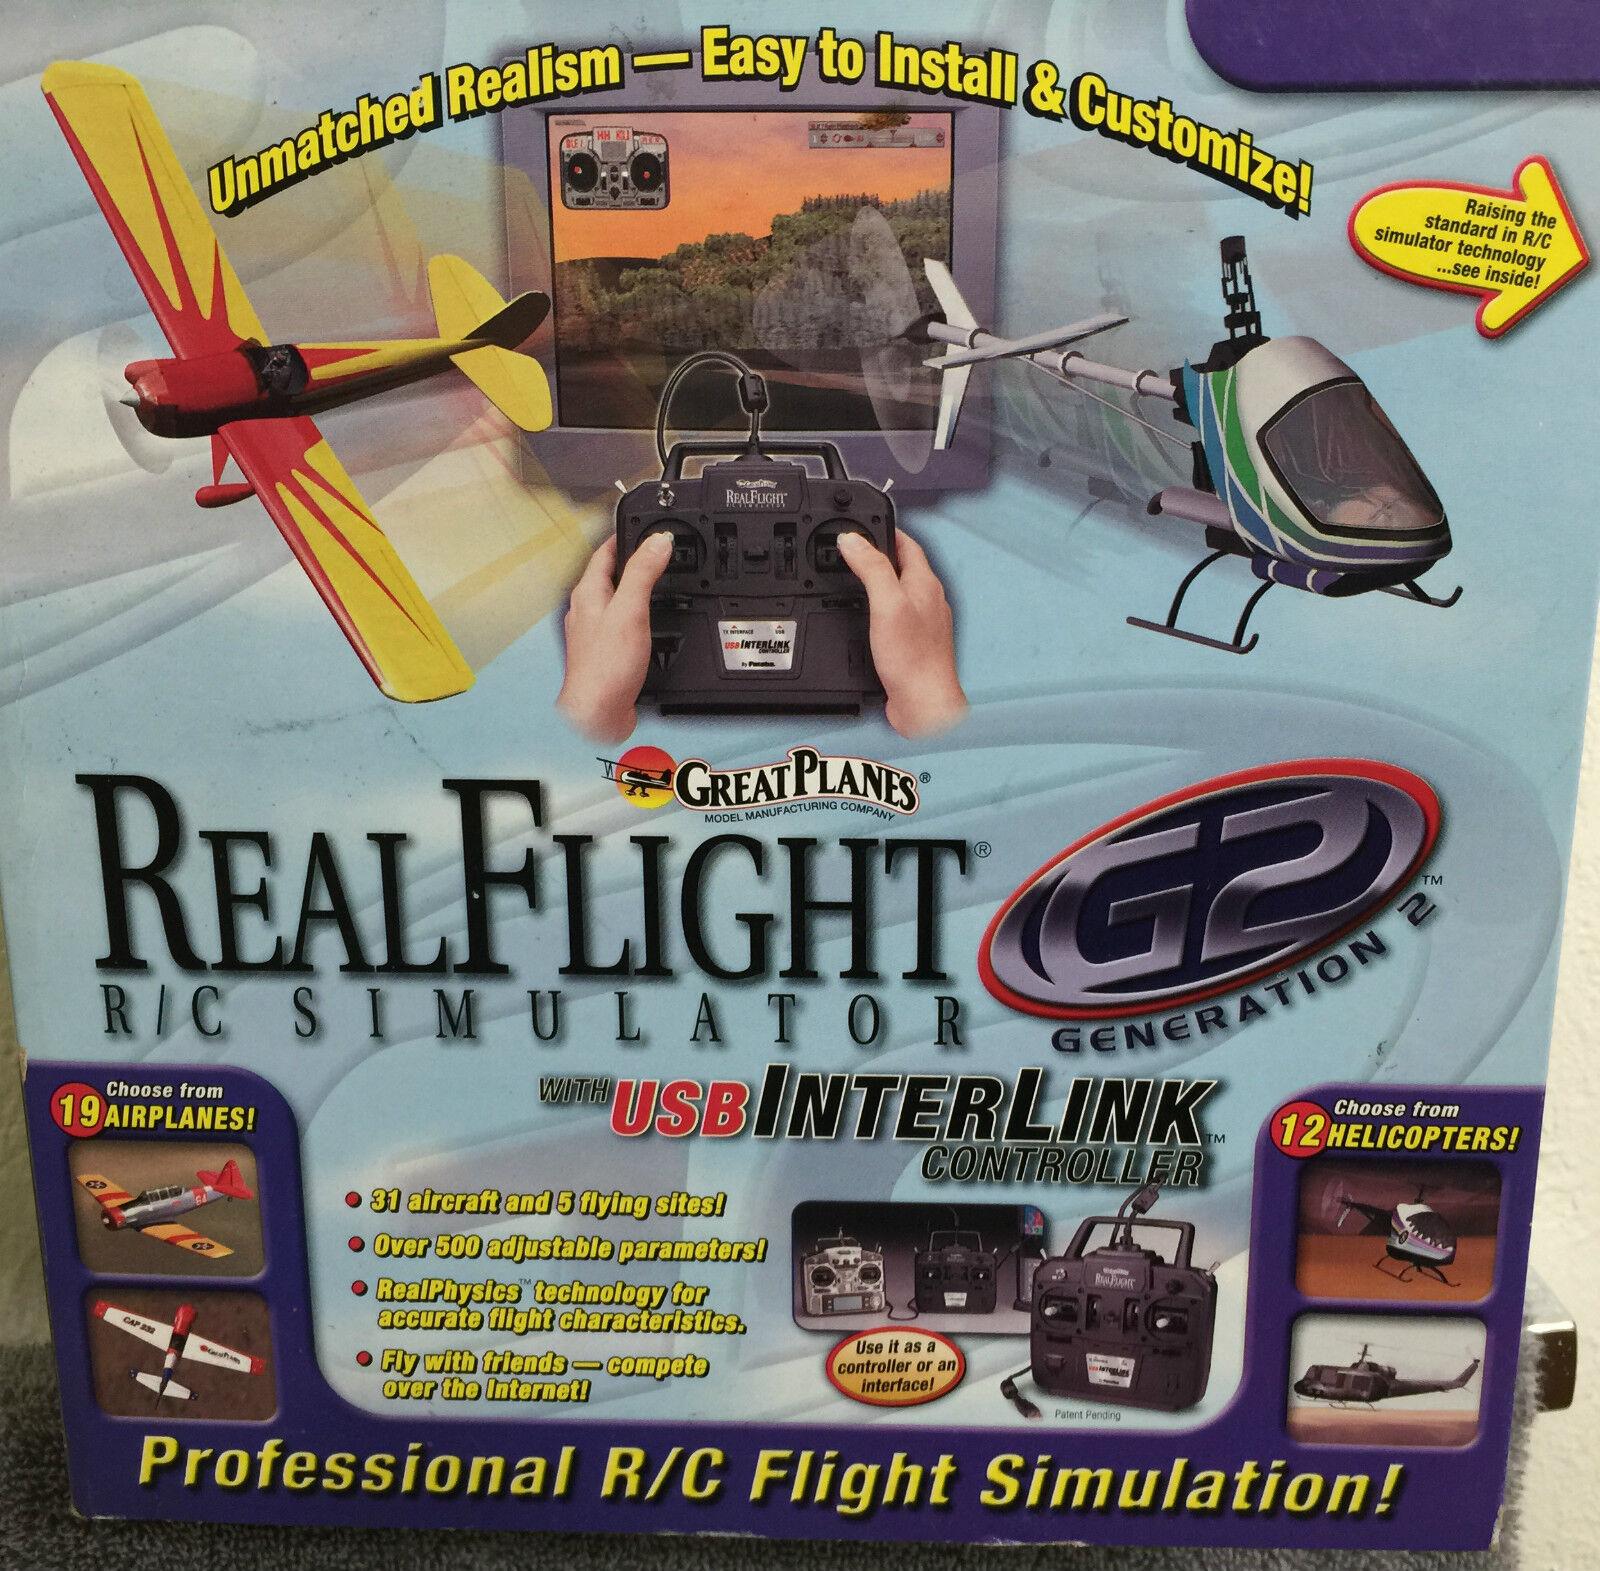 GREAT PLANES REAL FLIGHT R/C SIMULATOR-PROFESSIONAL REAL FLIGHT SIMULATION-NEW